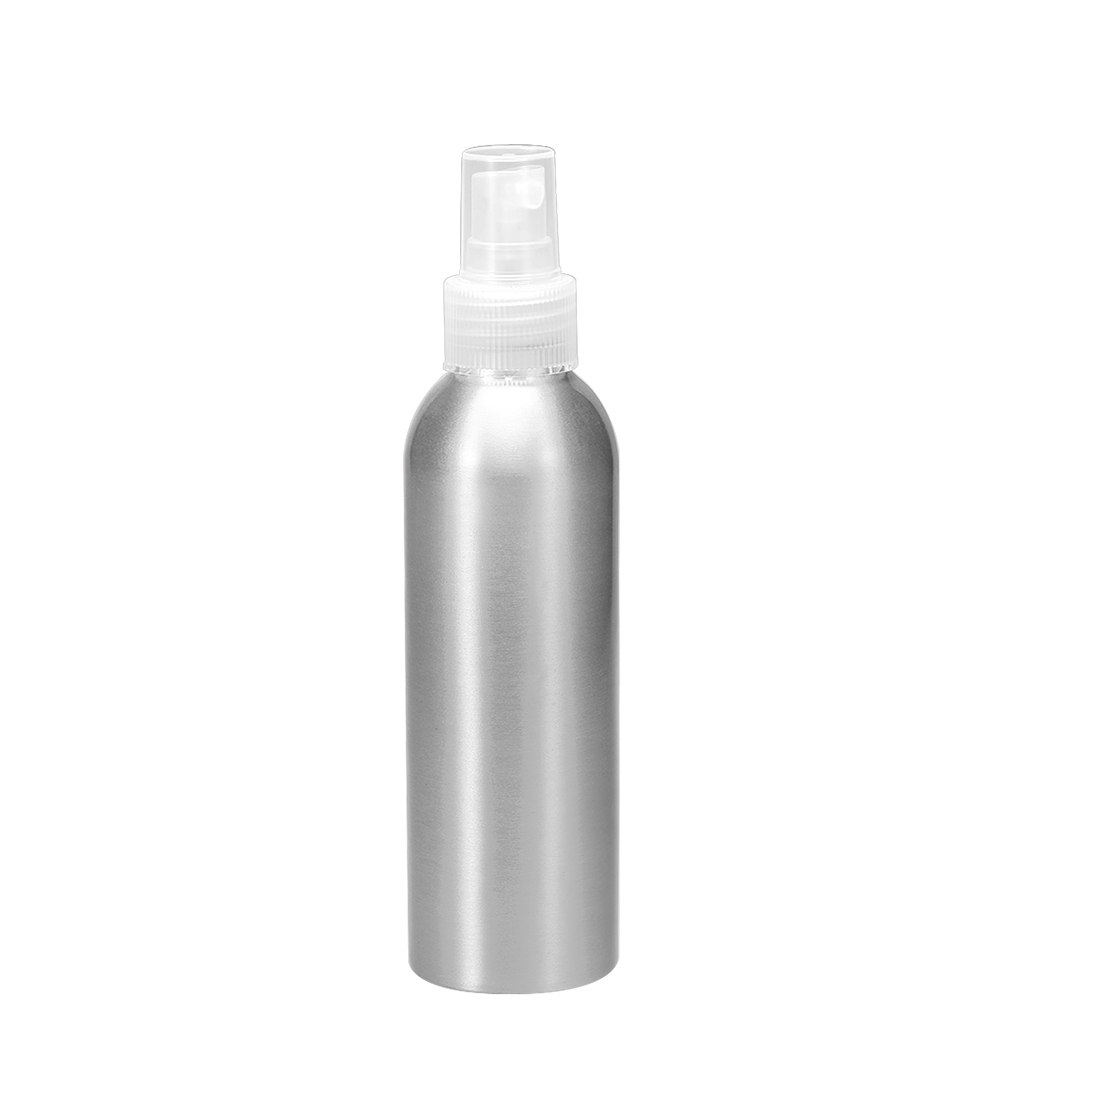 5oz/150ml Aluminium Spray Bottle with Clear Sprayer, Empty Refillable Container